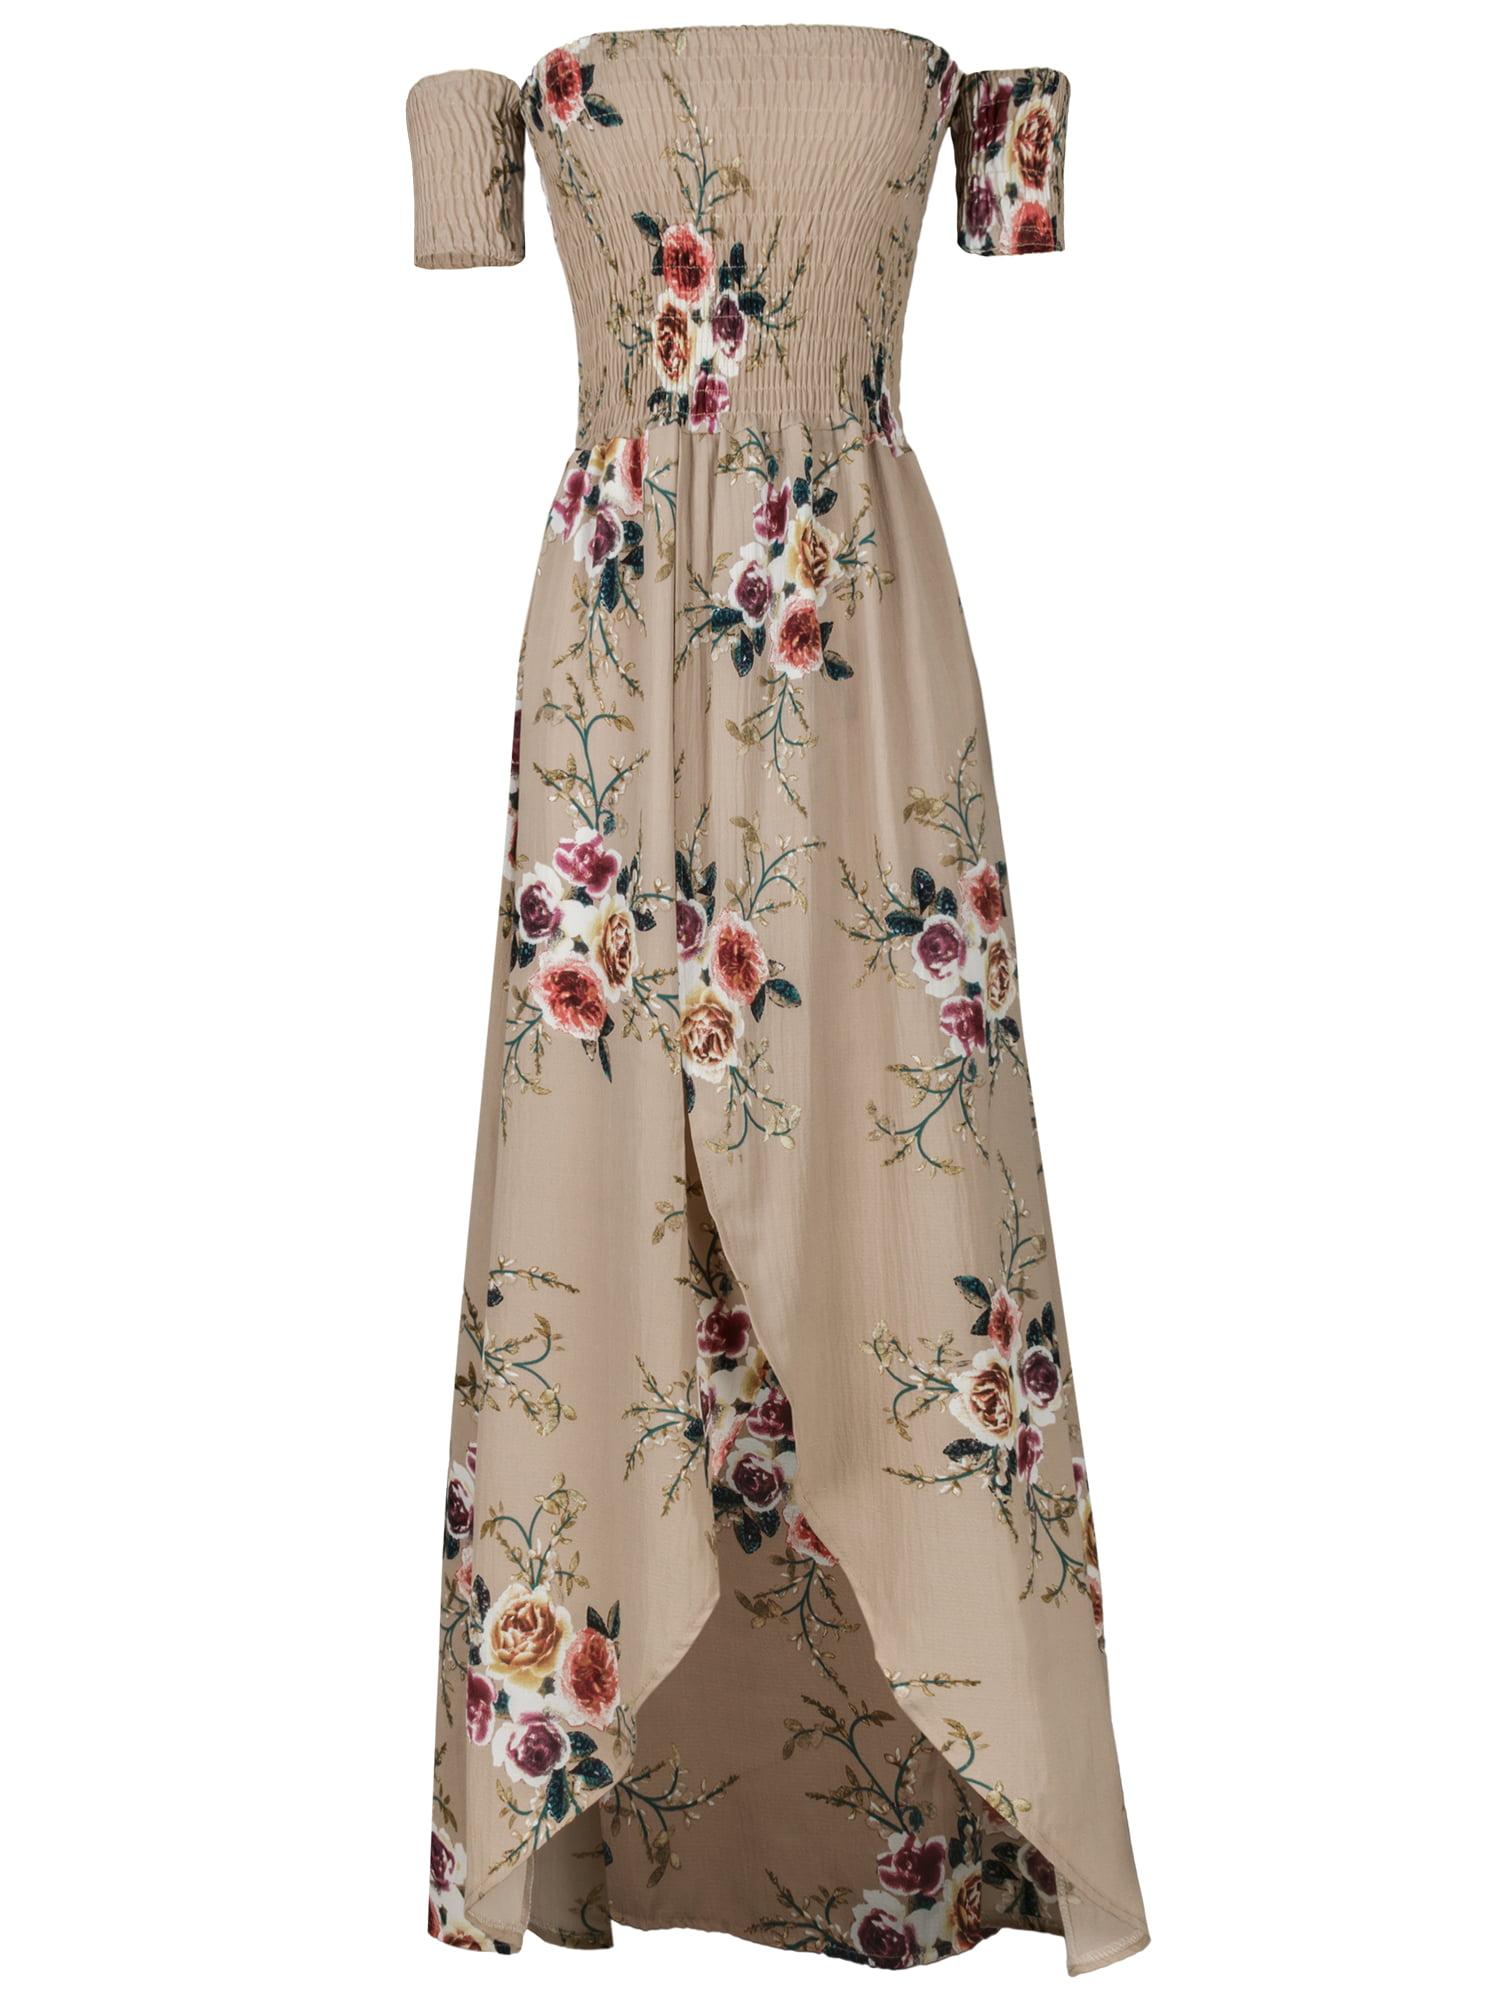 7757d82f0134 Newstar - Newstar Boho Maxi Long Dresses for Women